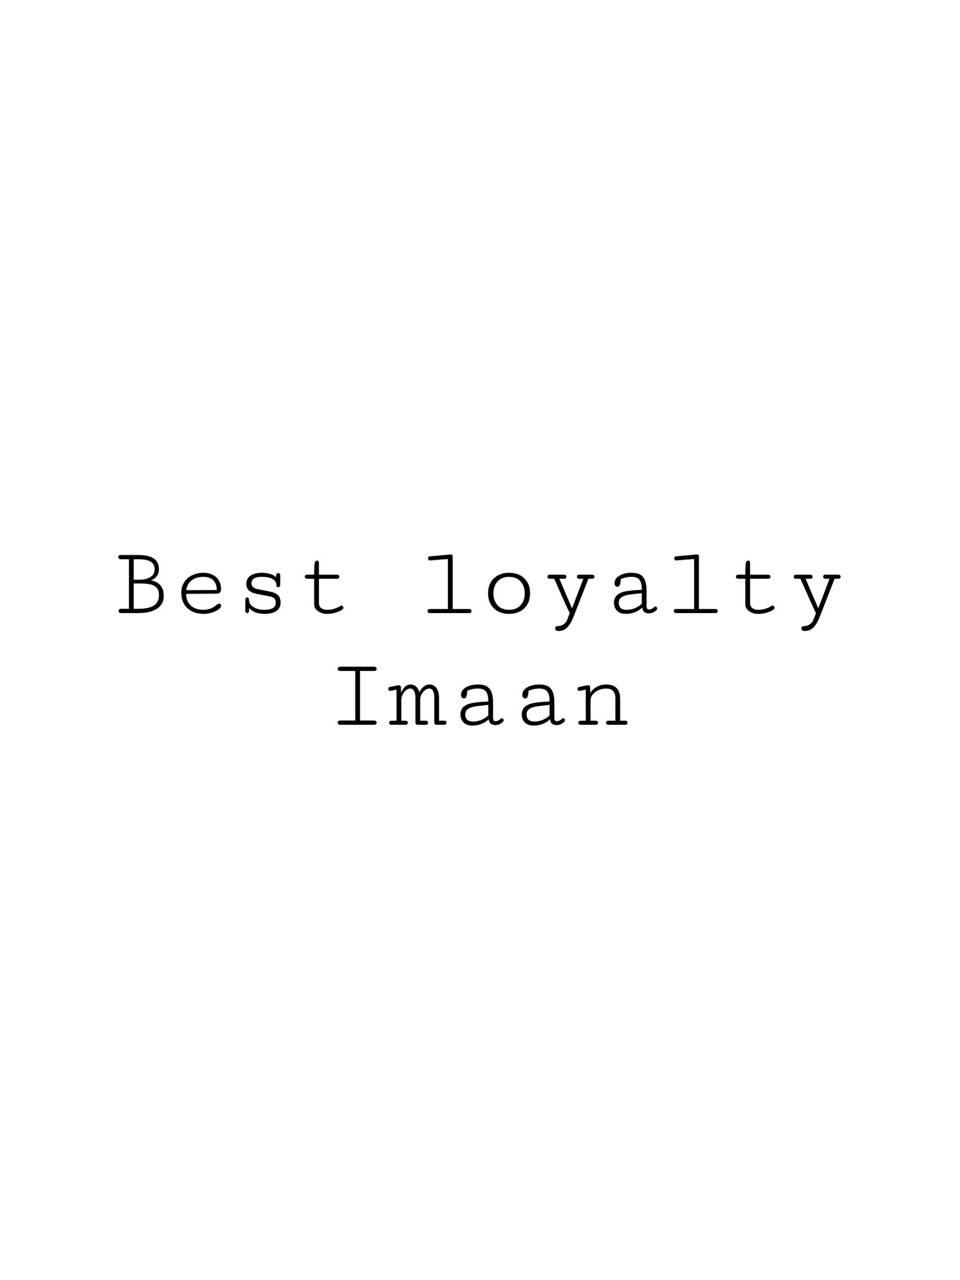 Islam -Imaan